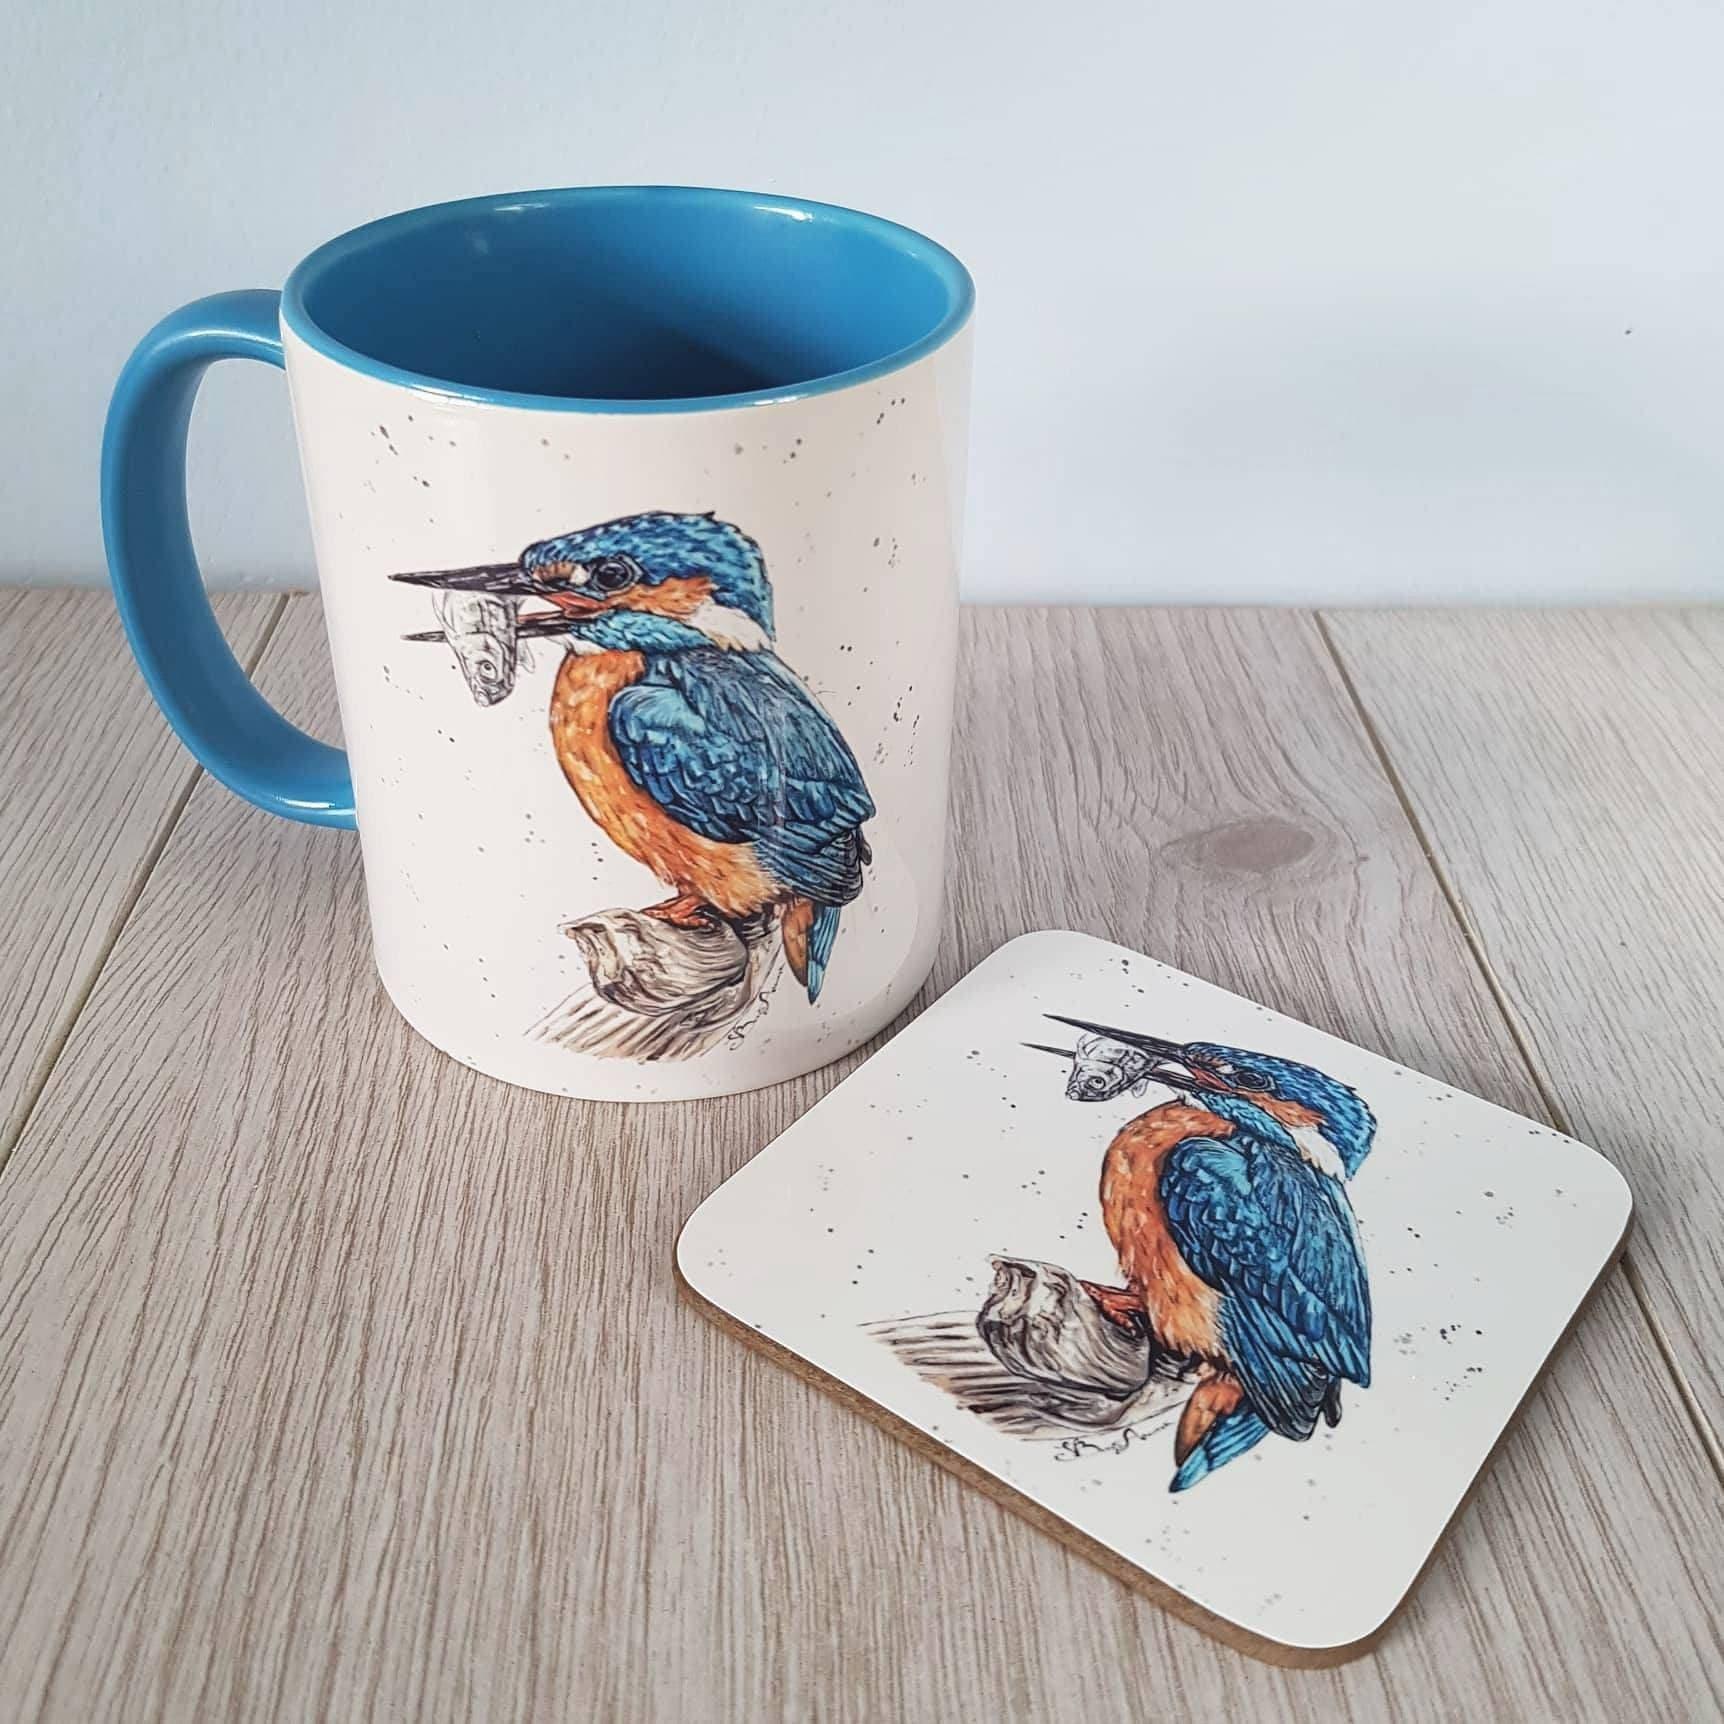 My Water colour bird print on mug